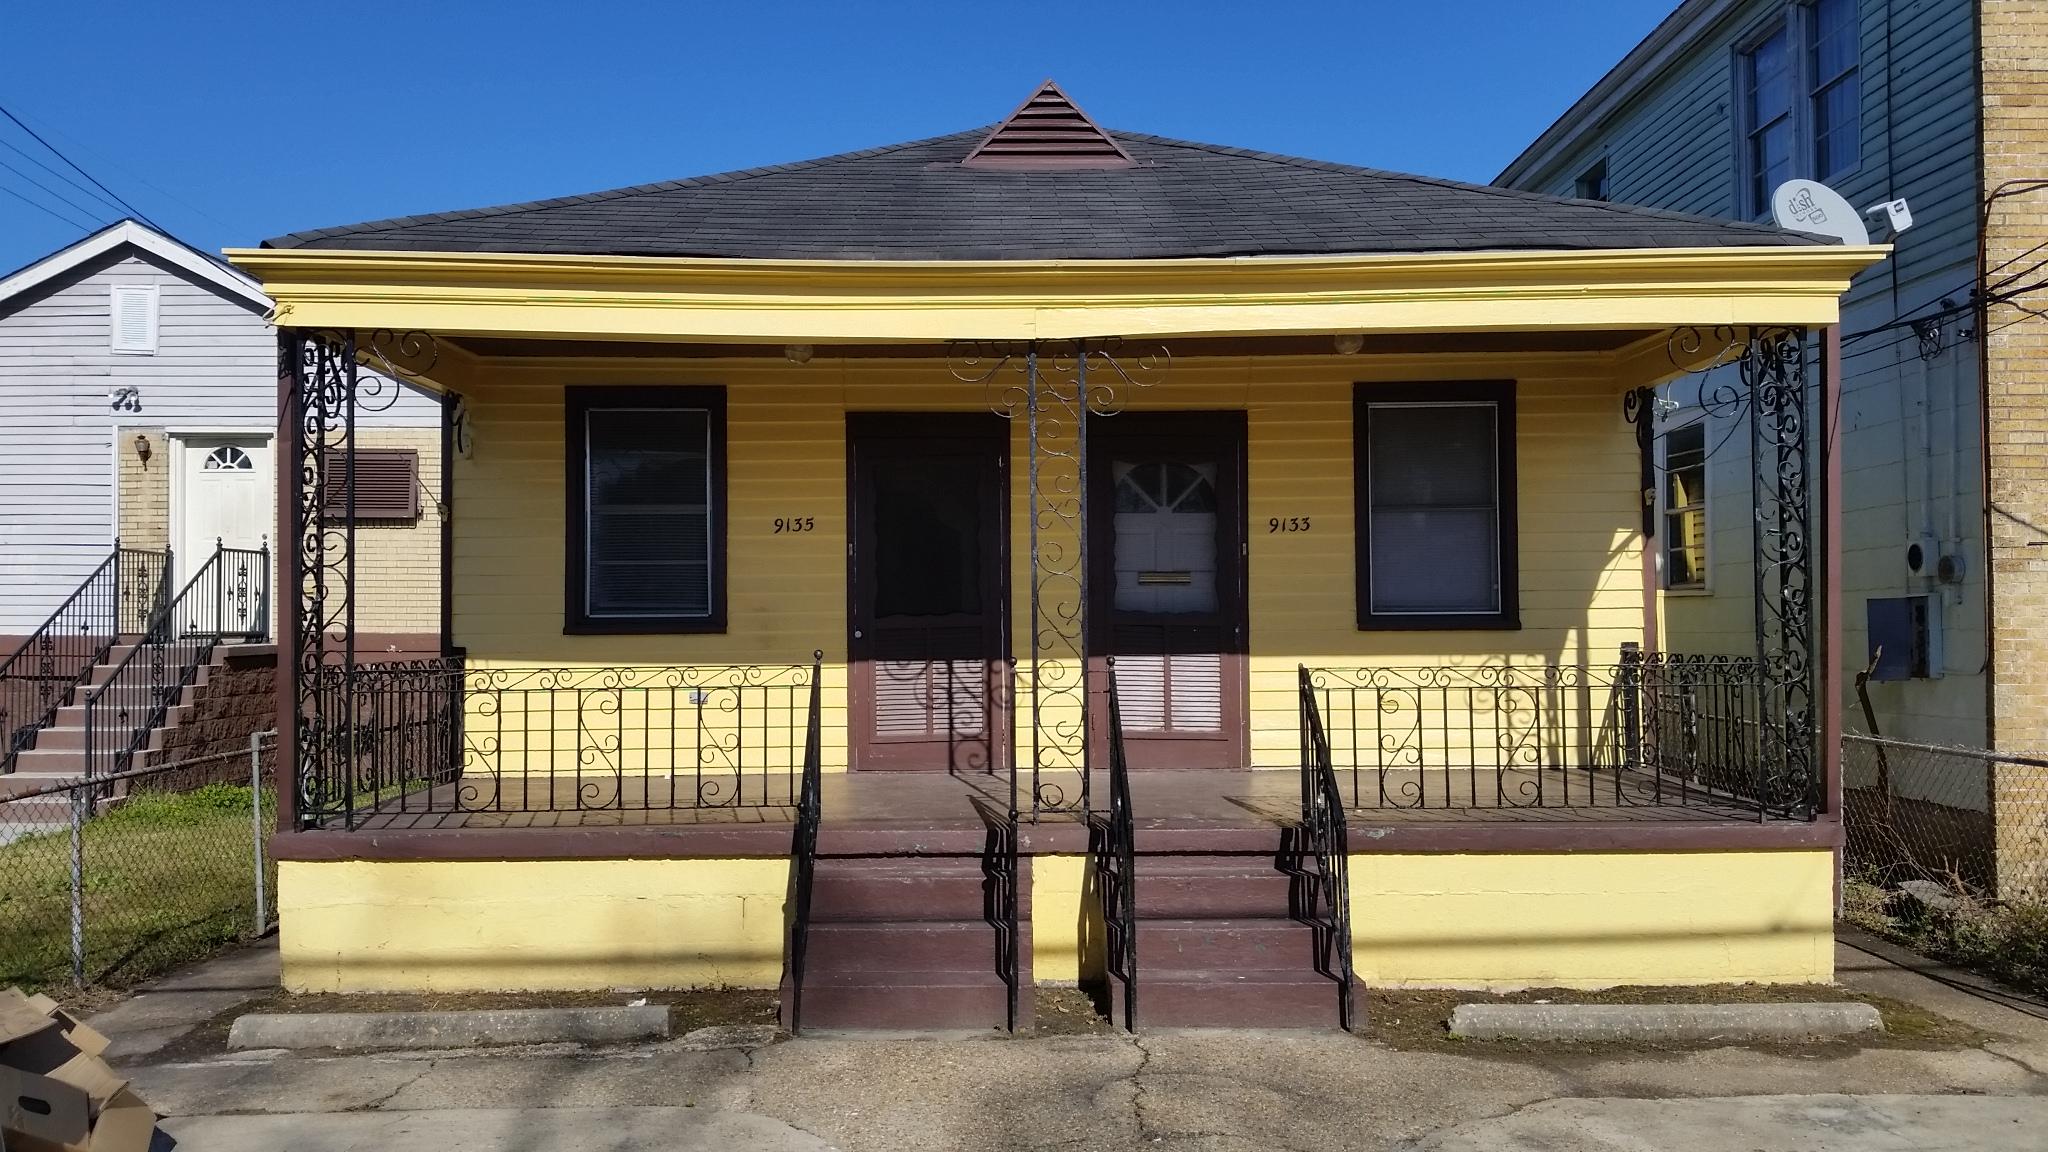 9135 Fig Street, New Orleans, Louisiana 70118